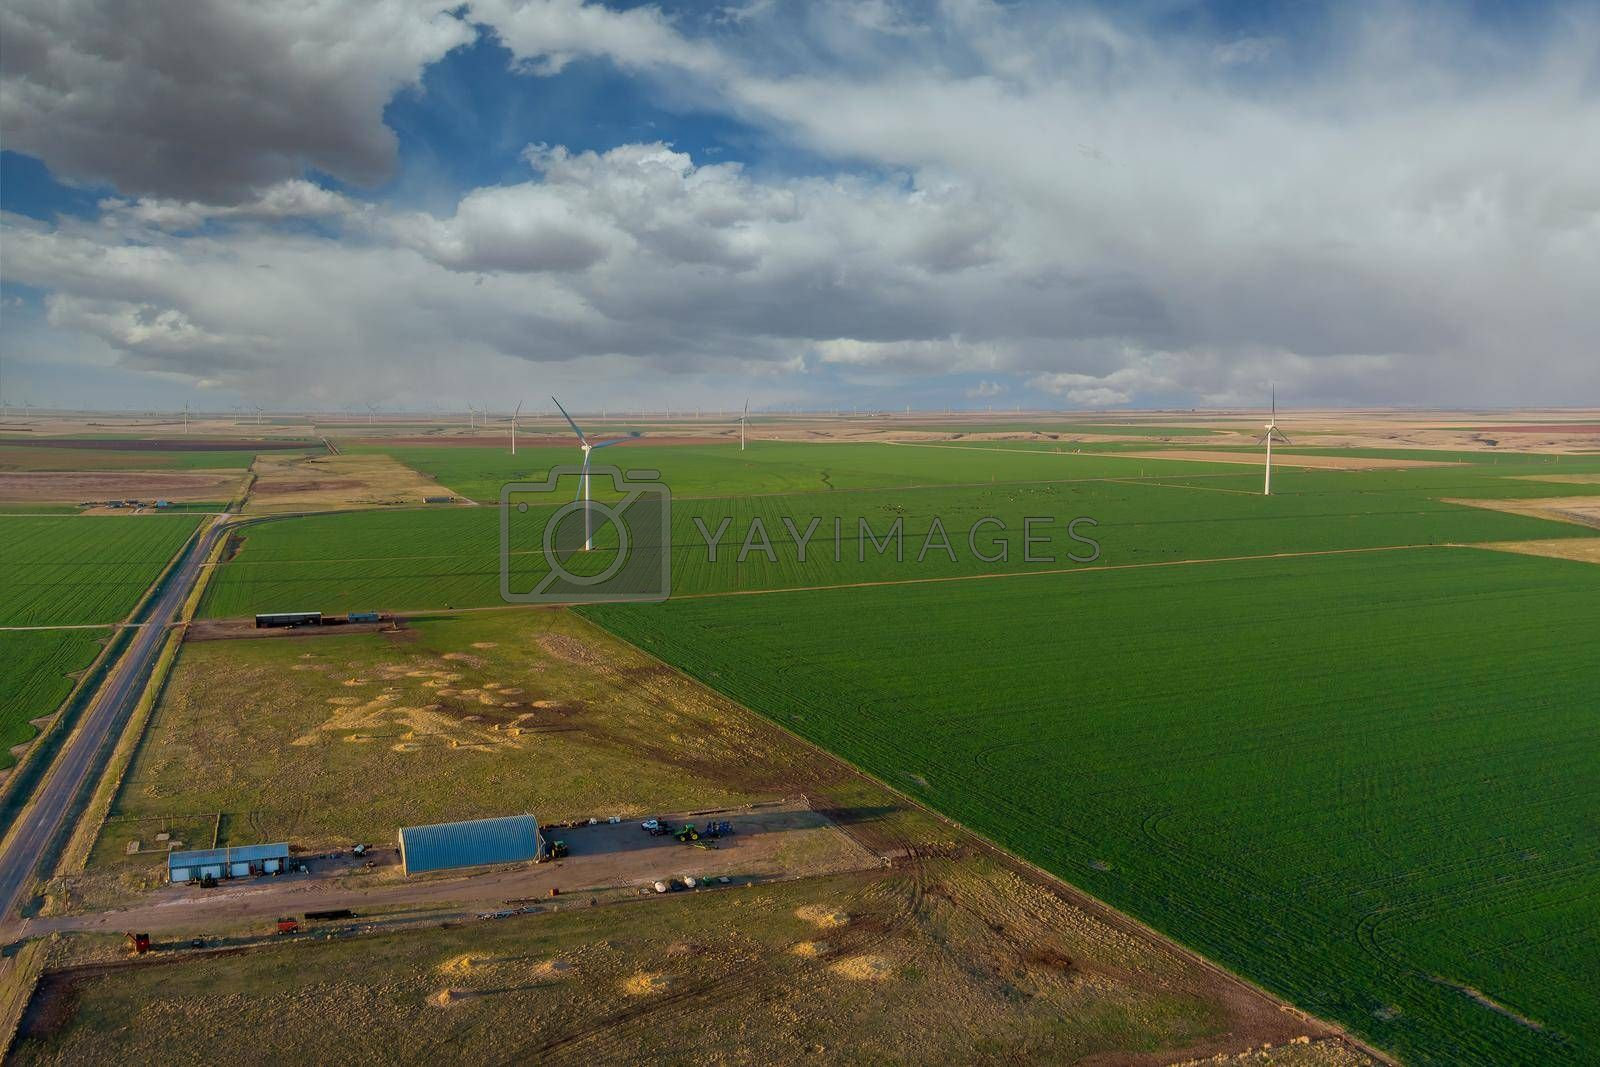 Wind turbines windmill energy farm in West Texas plains under a blue sky